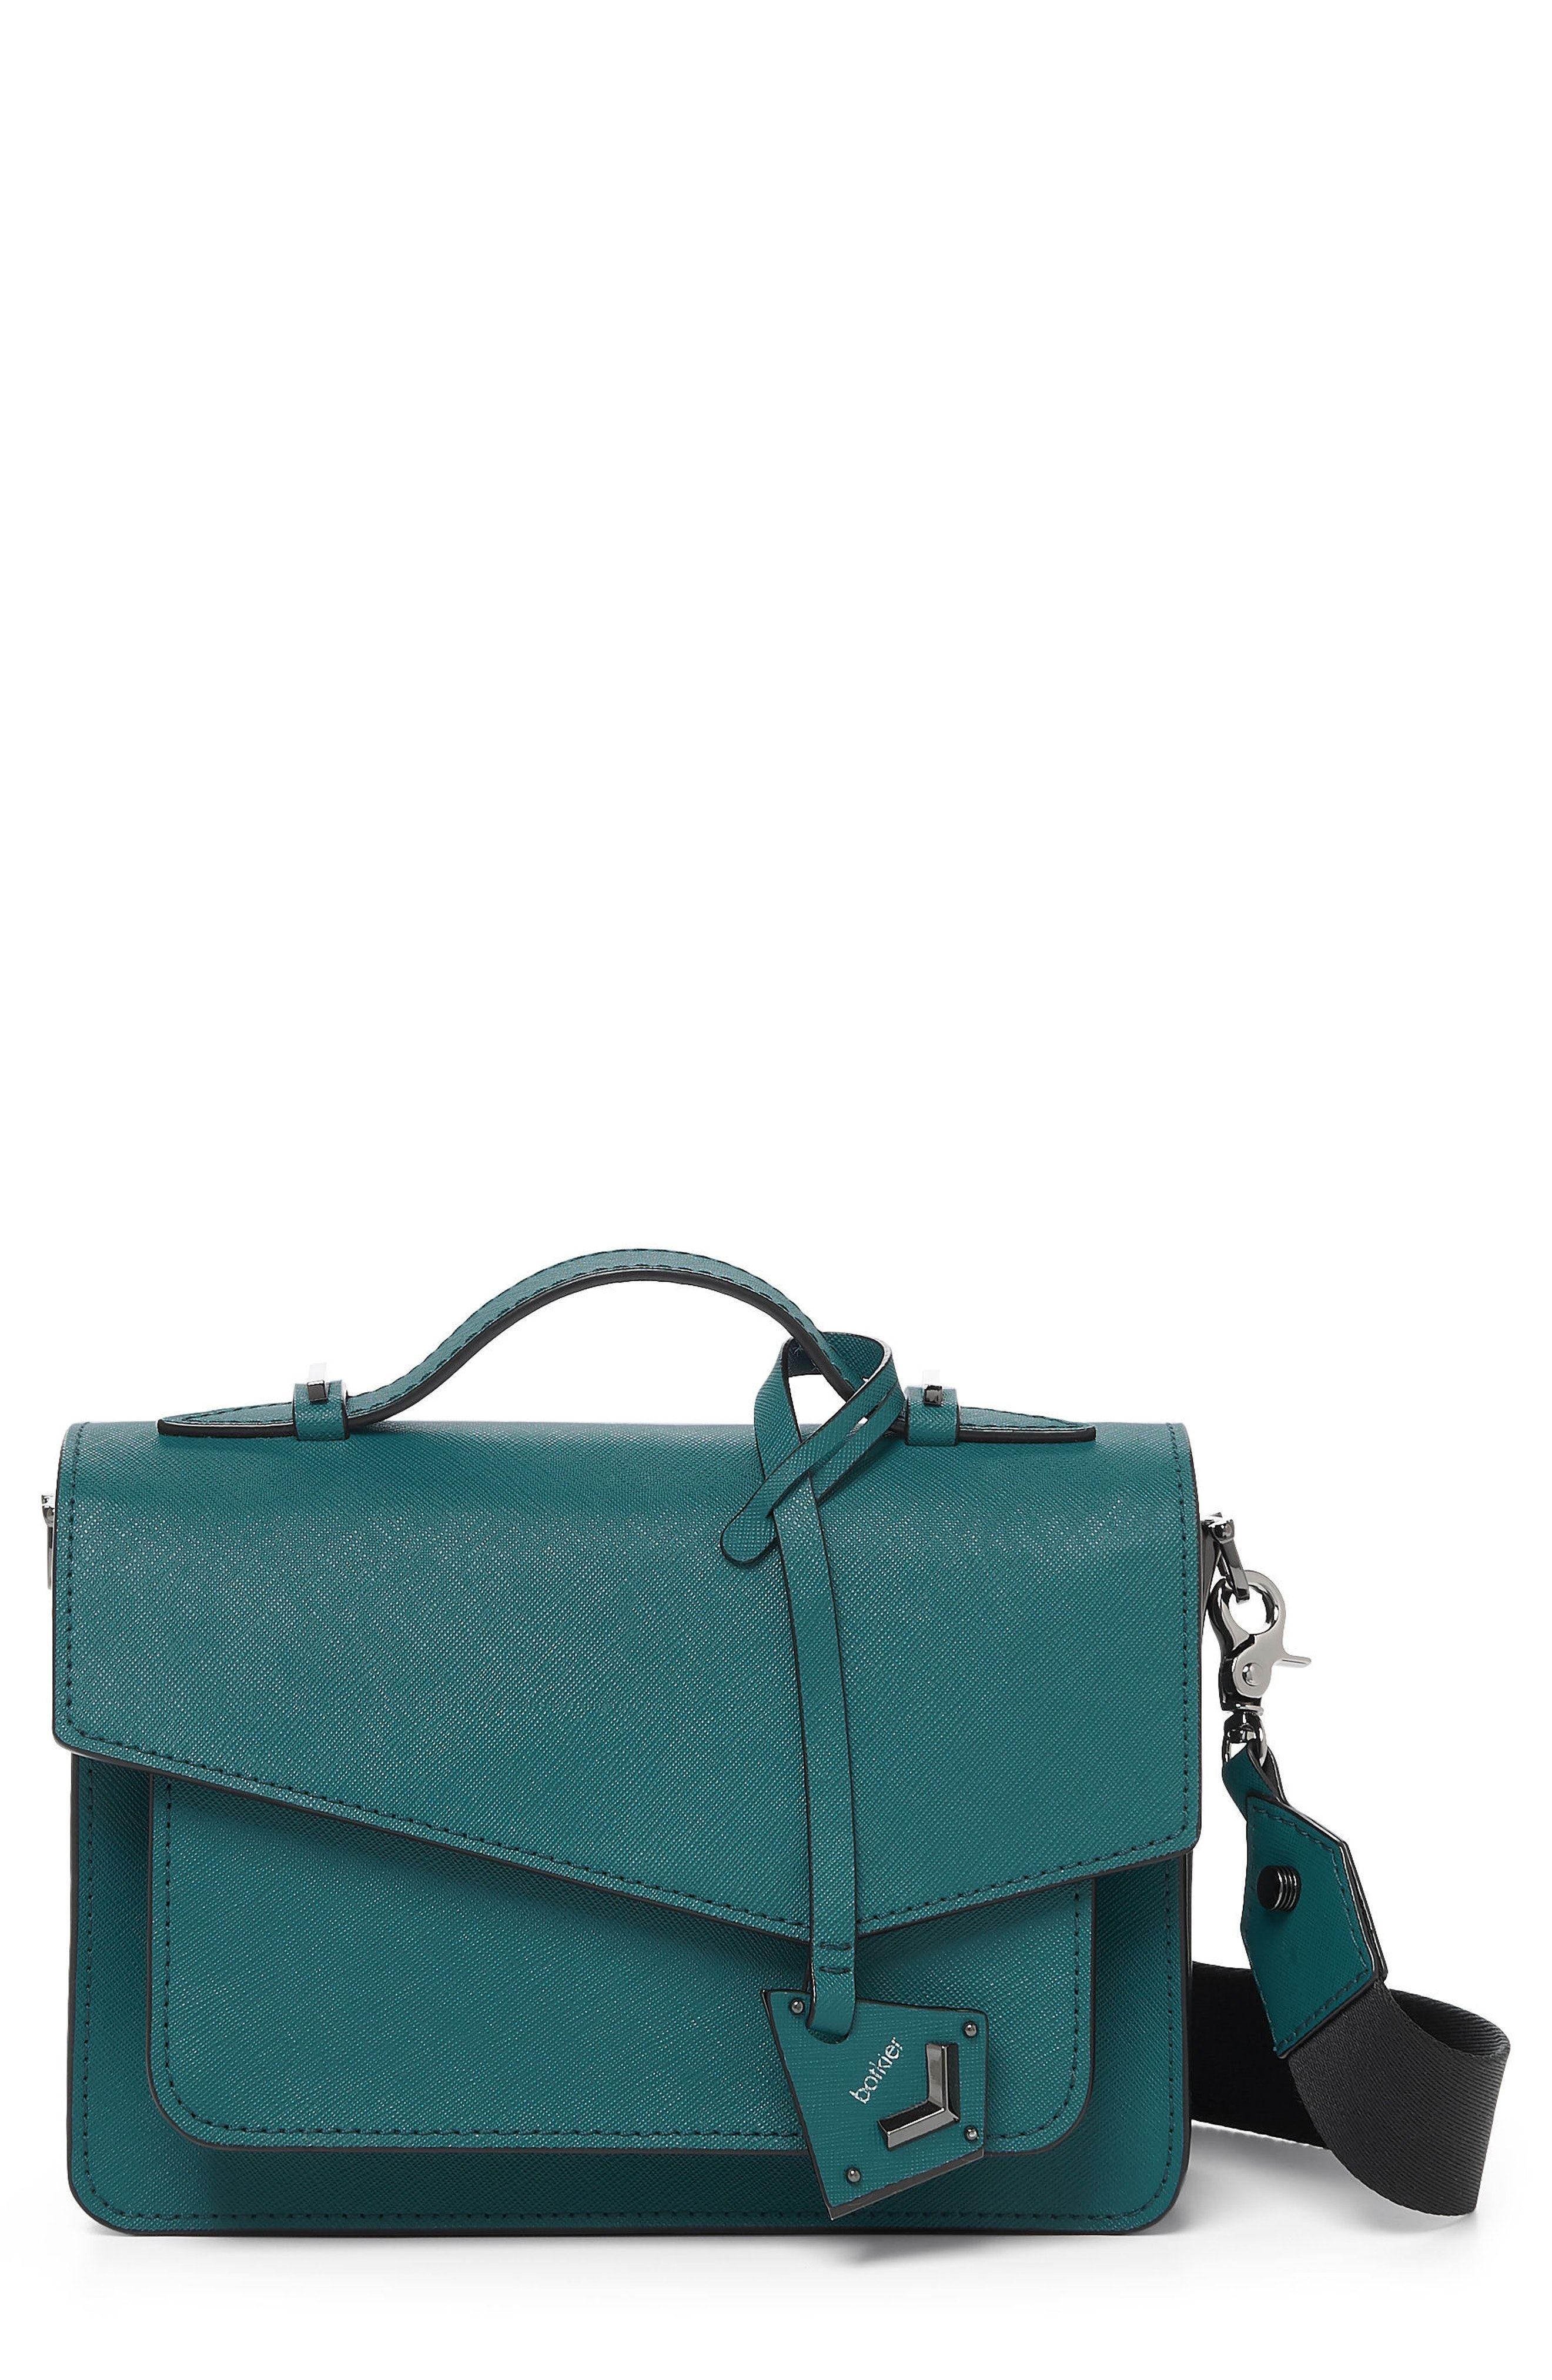 New Botkier Cobble Hill Leather Crossbody Bag fashion online. [$198]?@shop.seehandbags<<